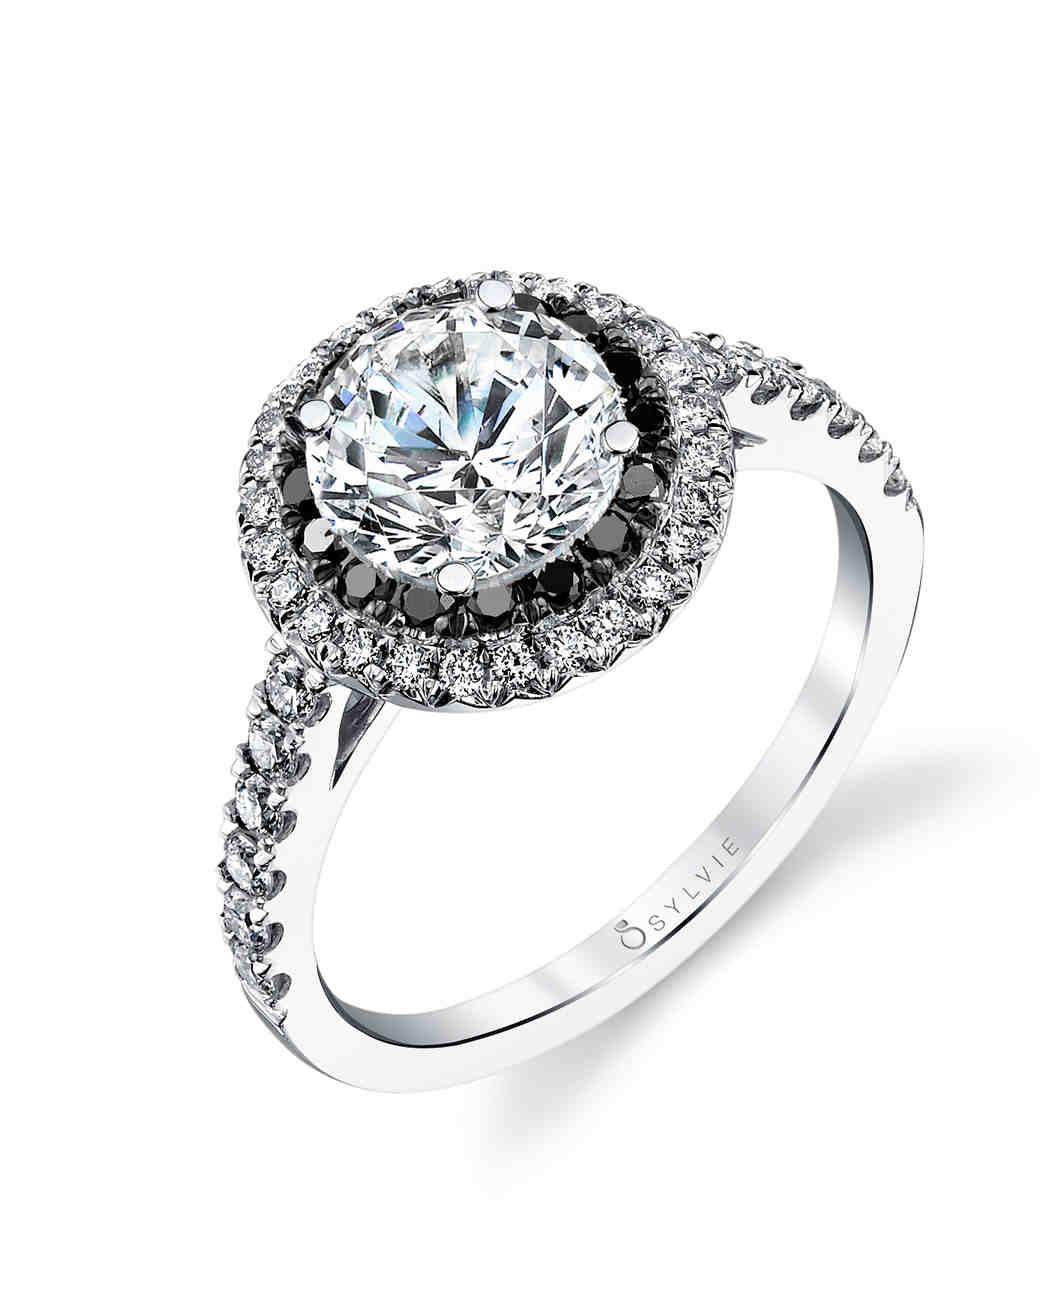 Etonnant The New LBD: The Little Black Diamond Engagement Ring | Martha Stewart  Weddings